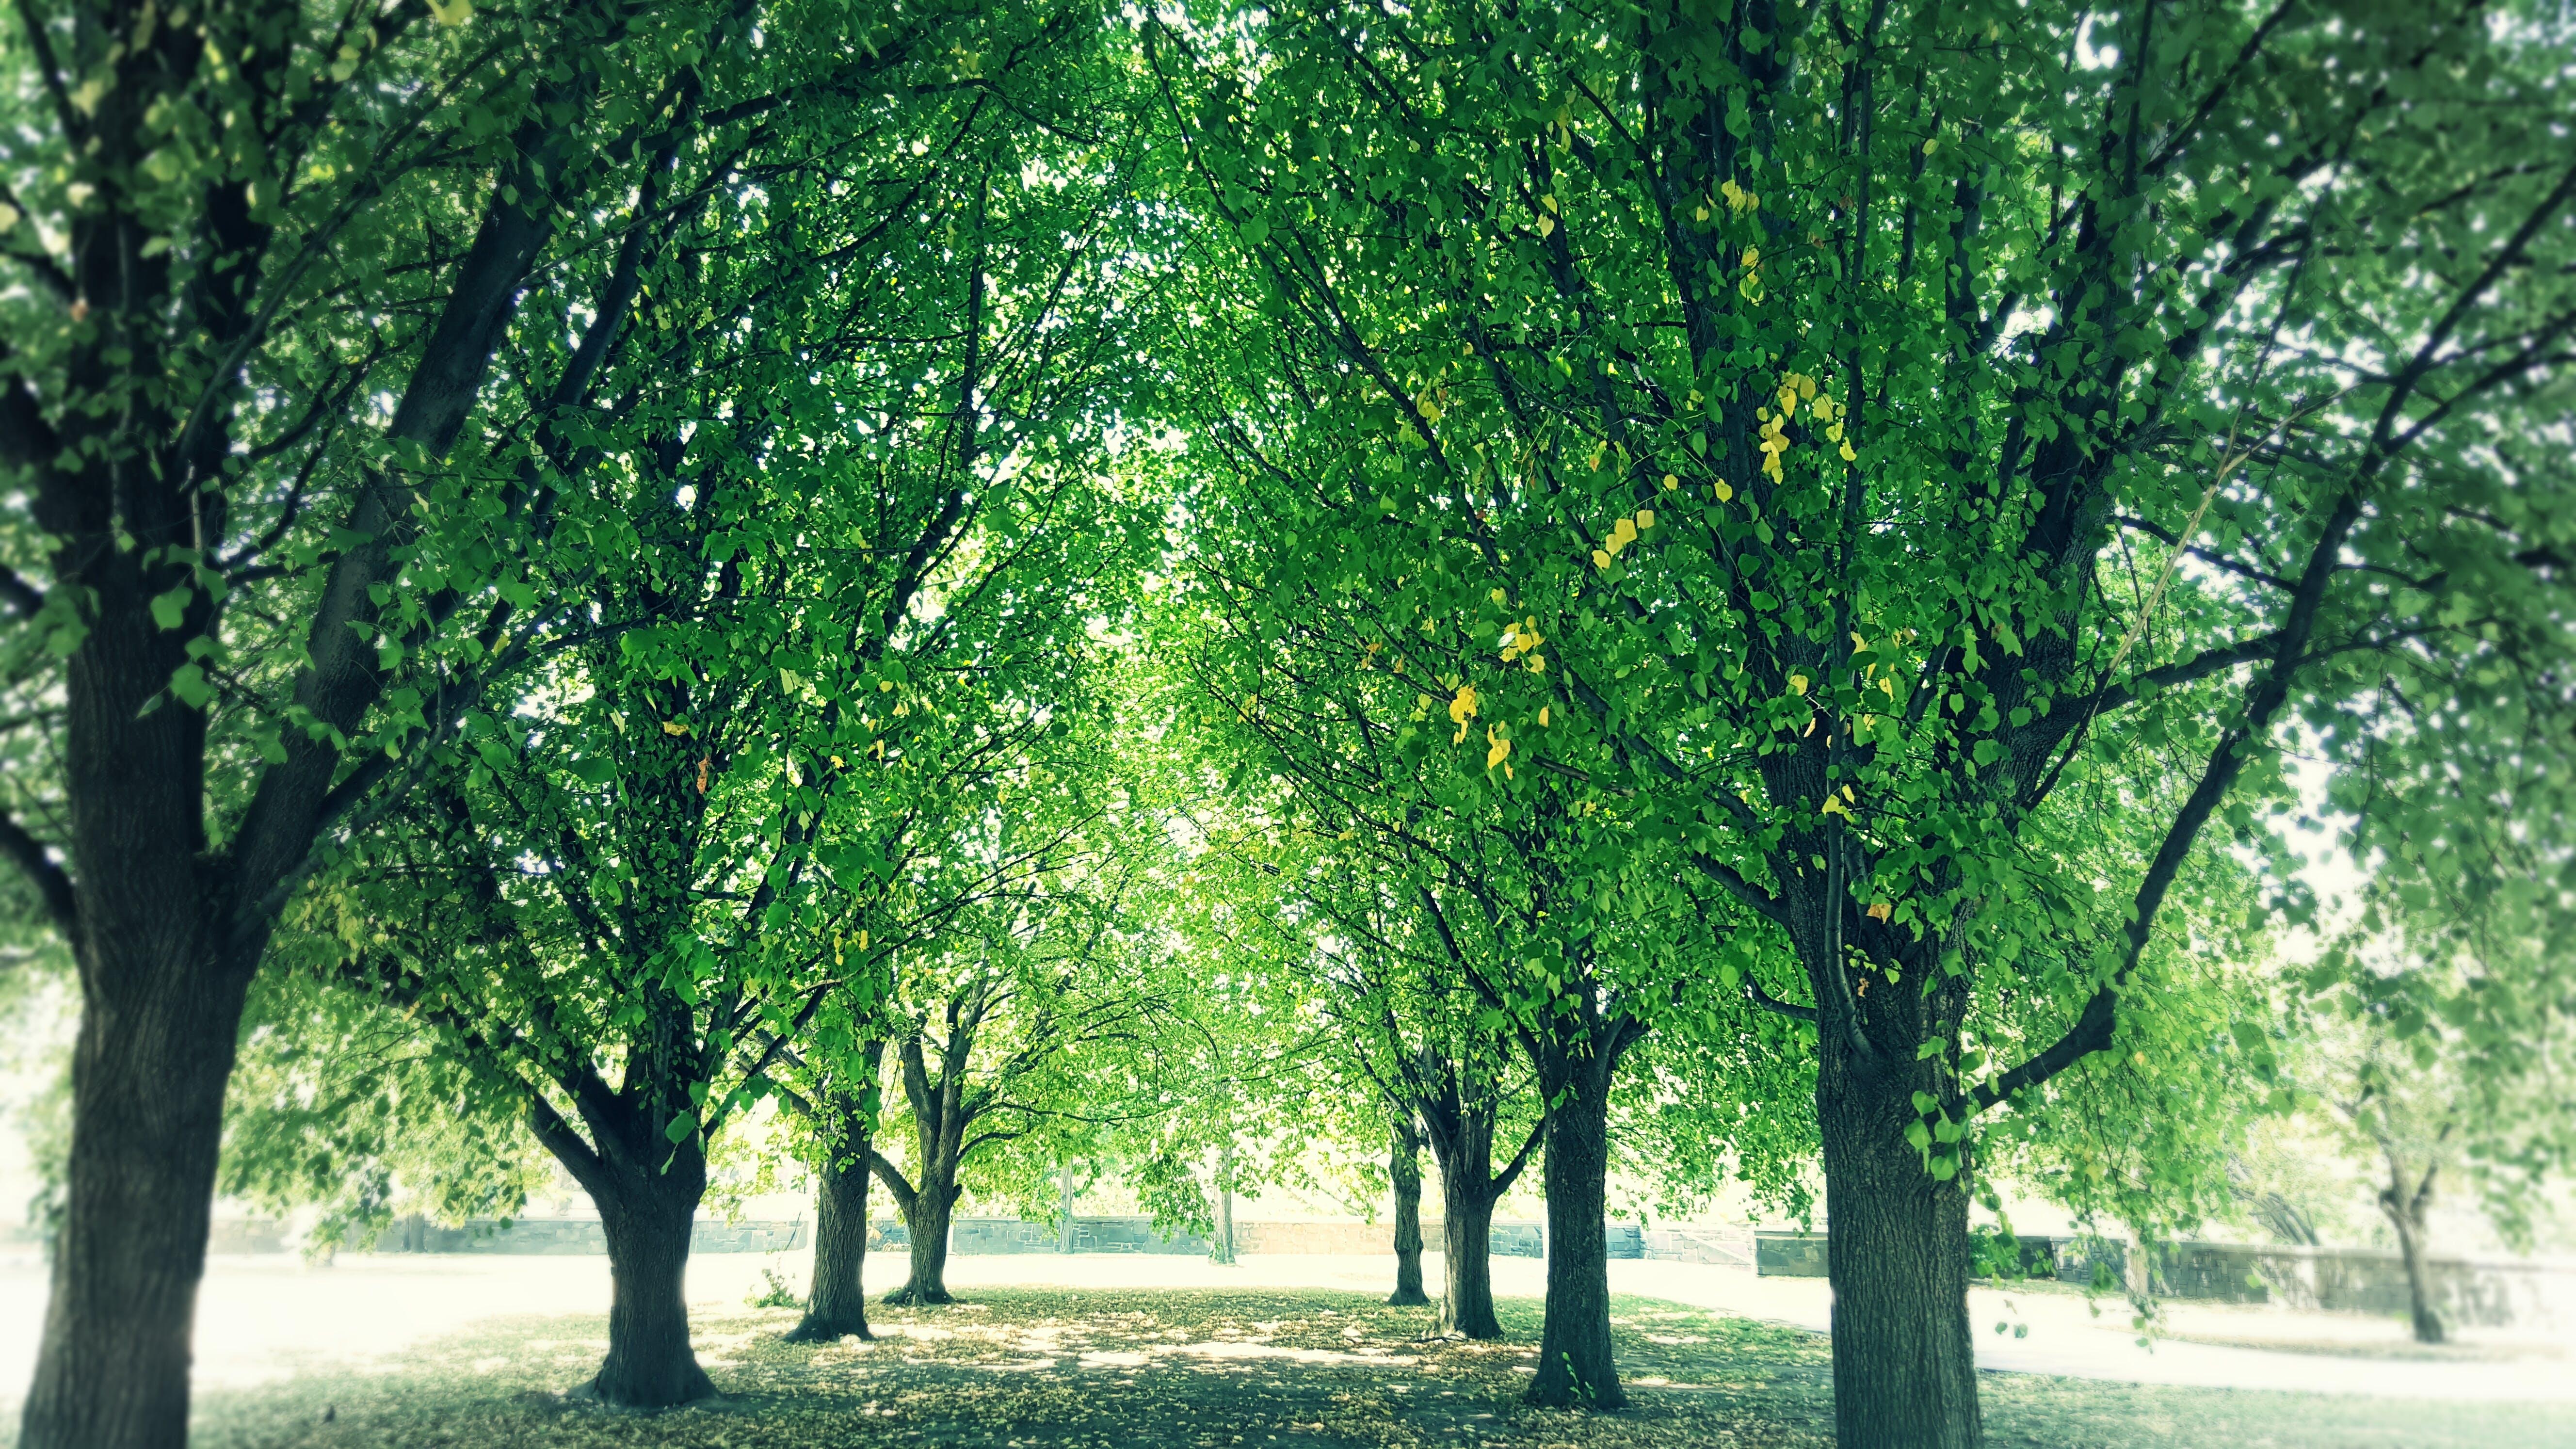 Kostenloses Stock Foto zu badehose, bäume, cool, grün